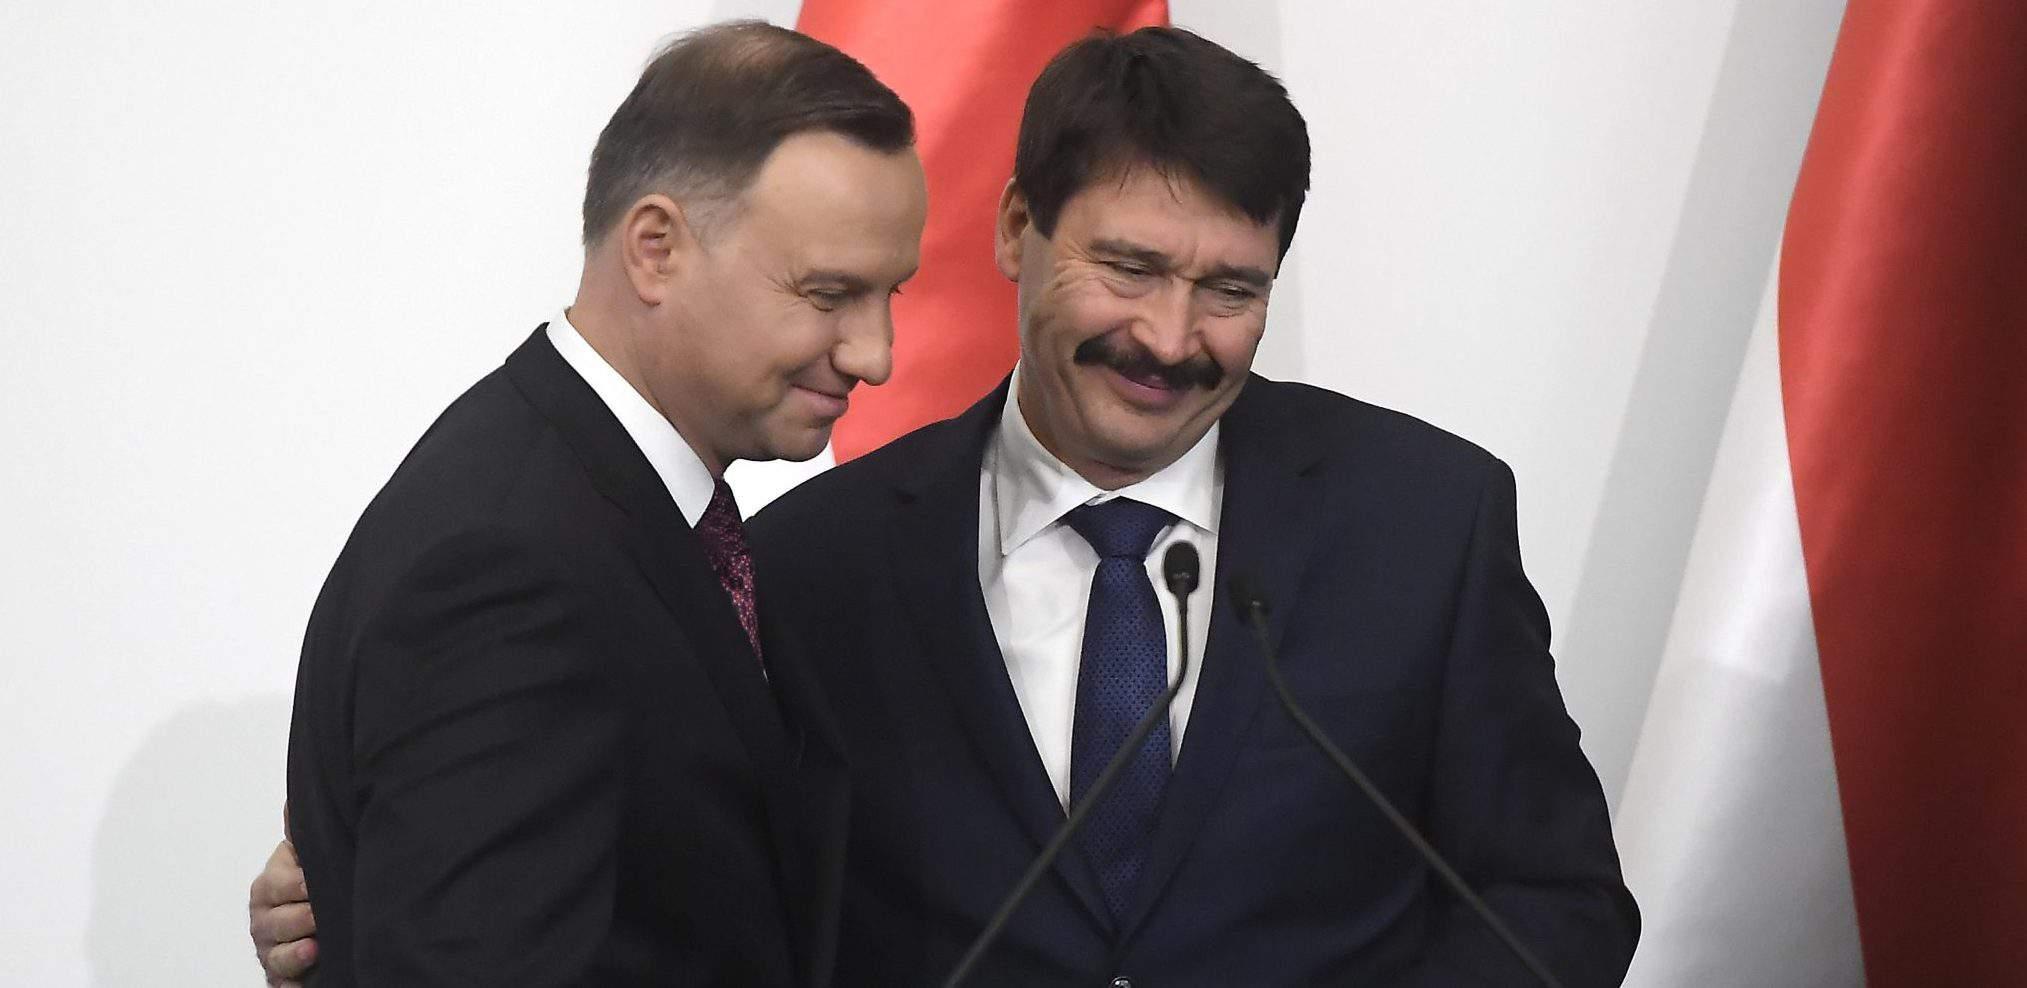 duda áder president hungary poland